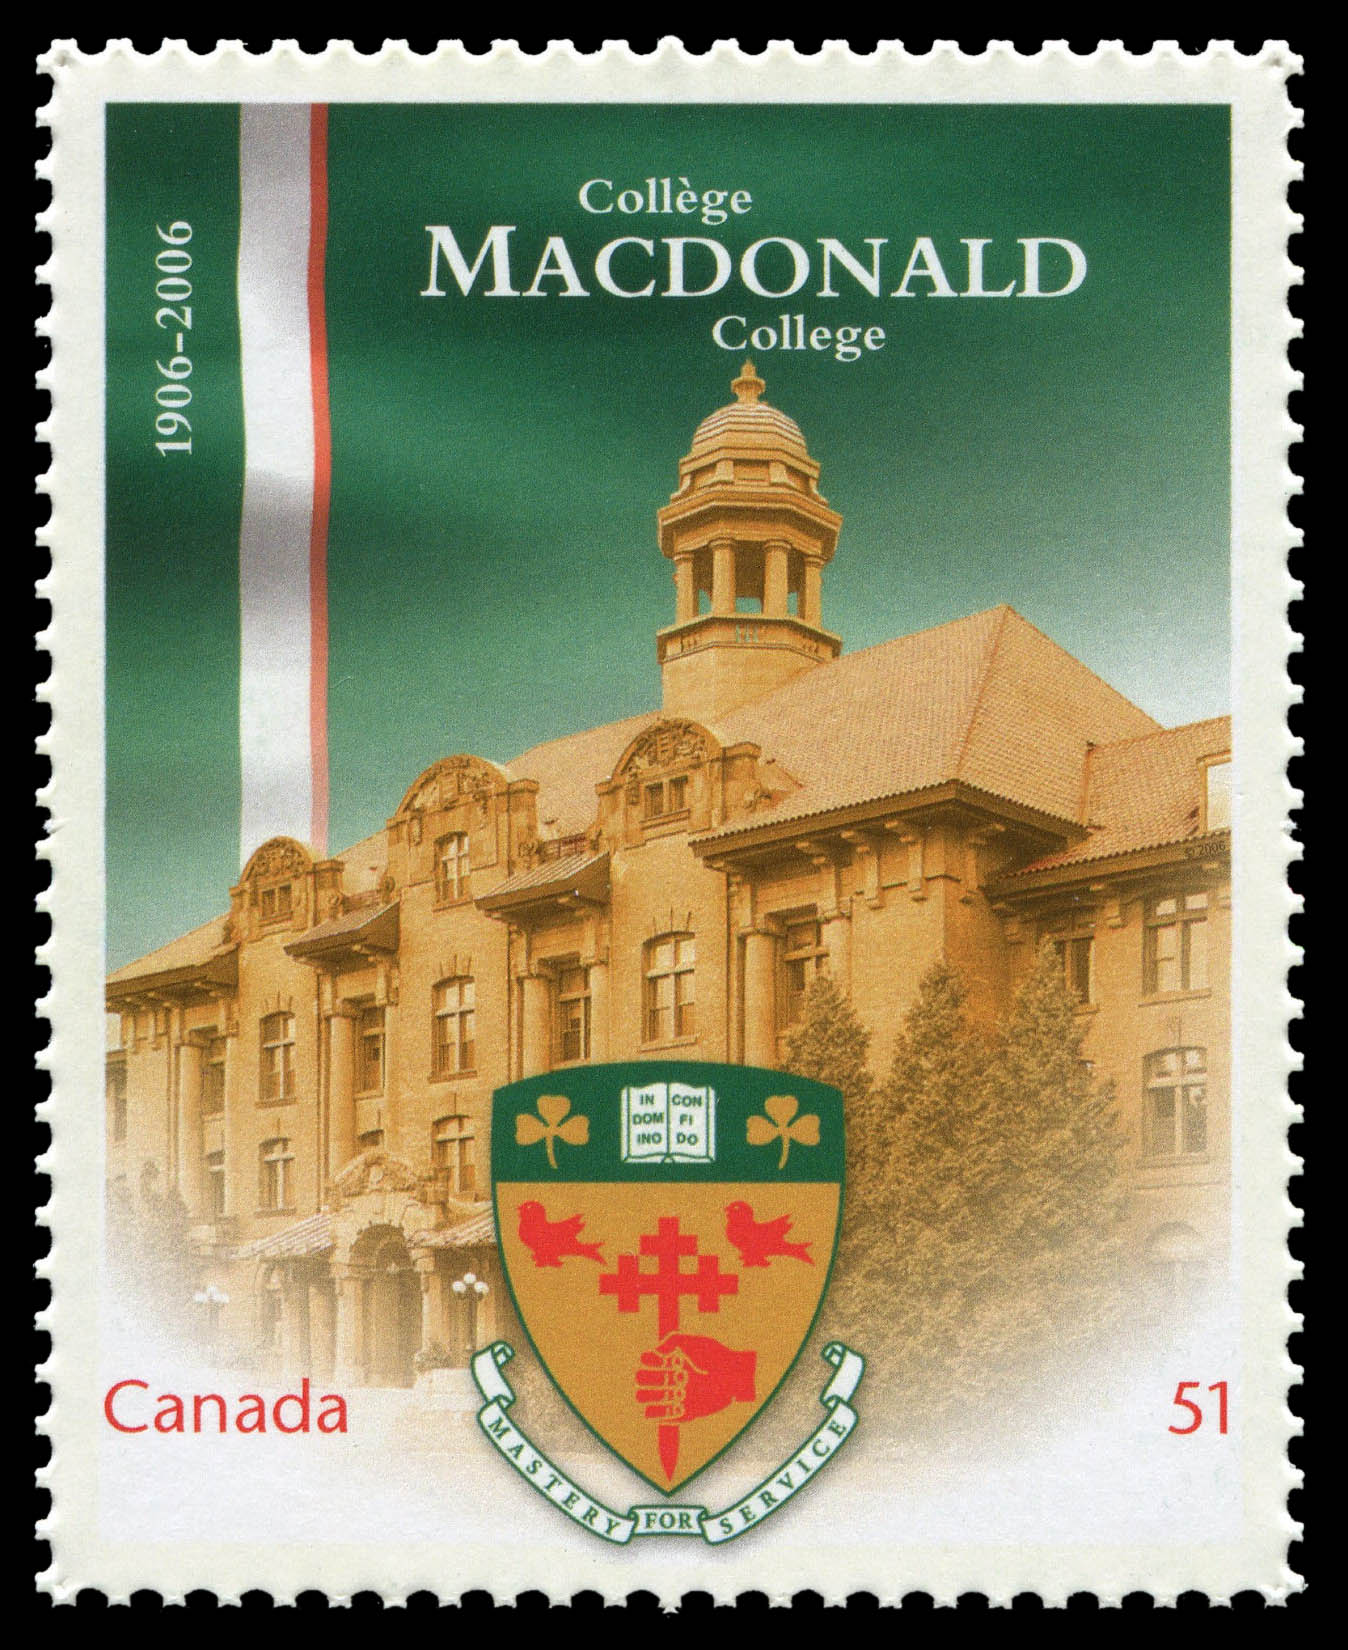 Macdonald College, 1906-2006 Canada Postage Stamp | Canadian Universities